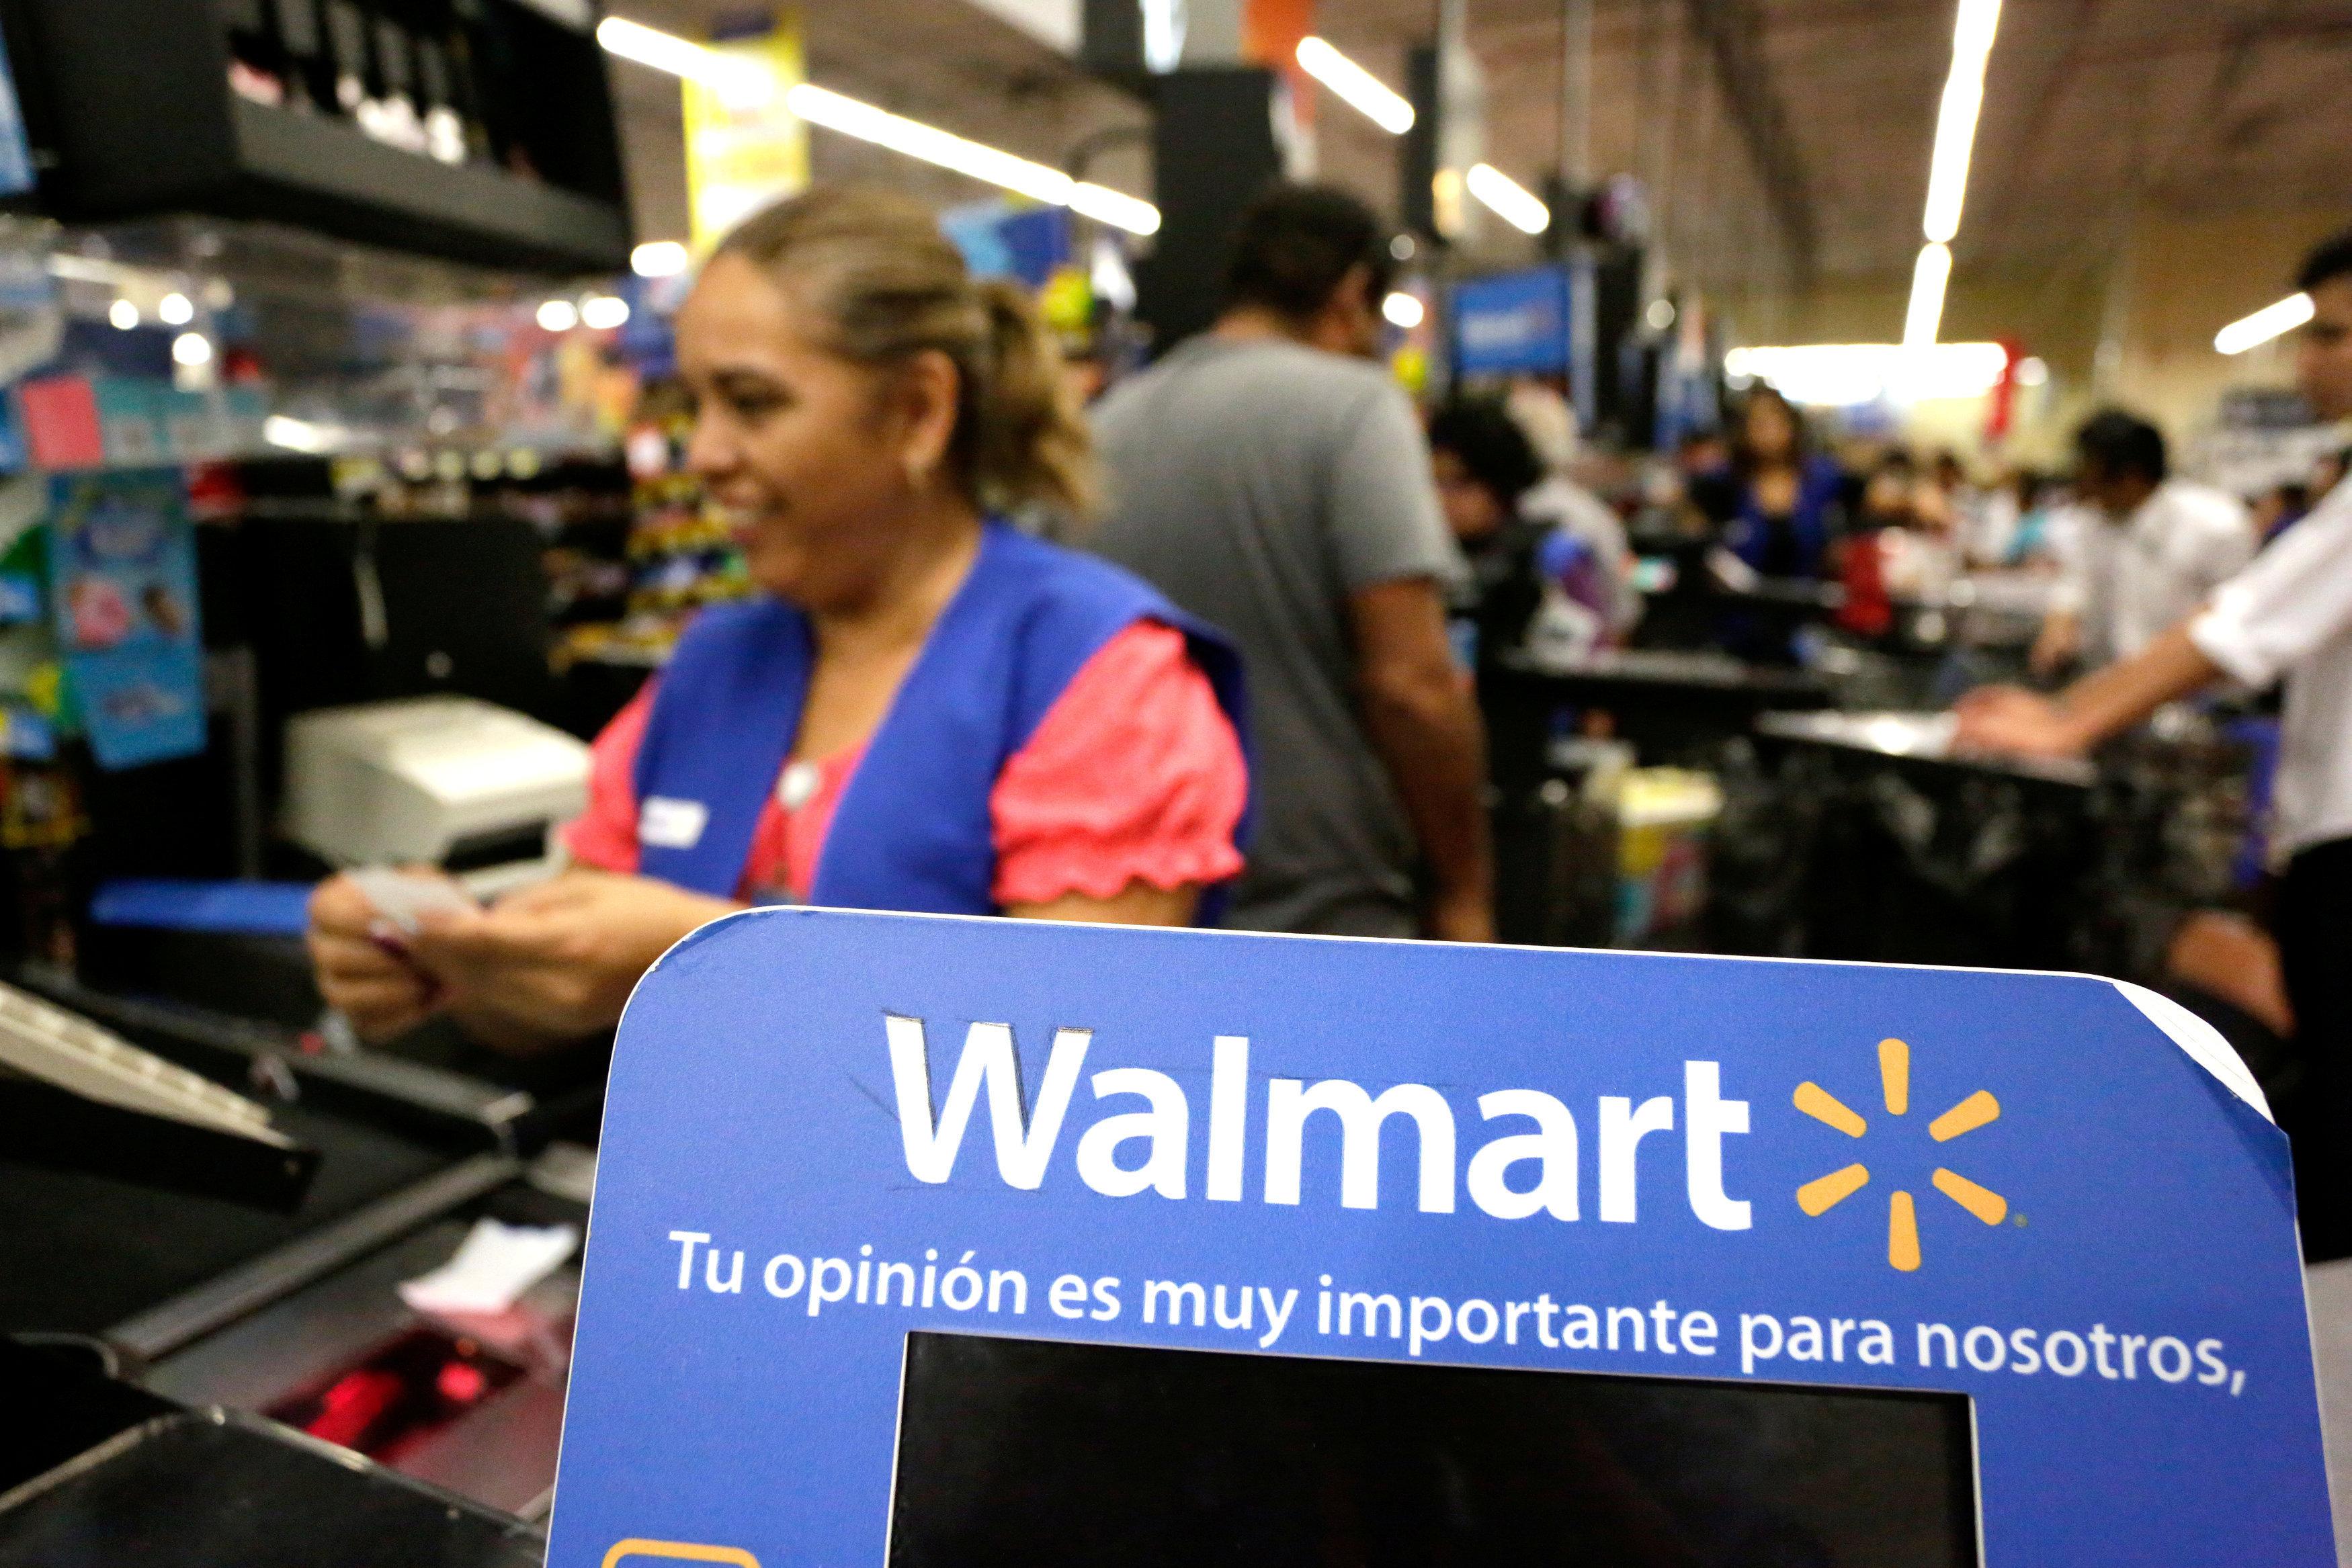 Walmart raises basic hourly wage to $11 on tax cuts